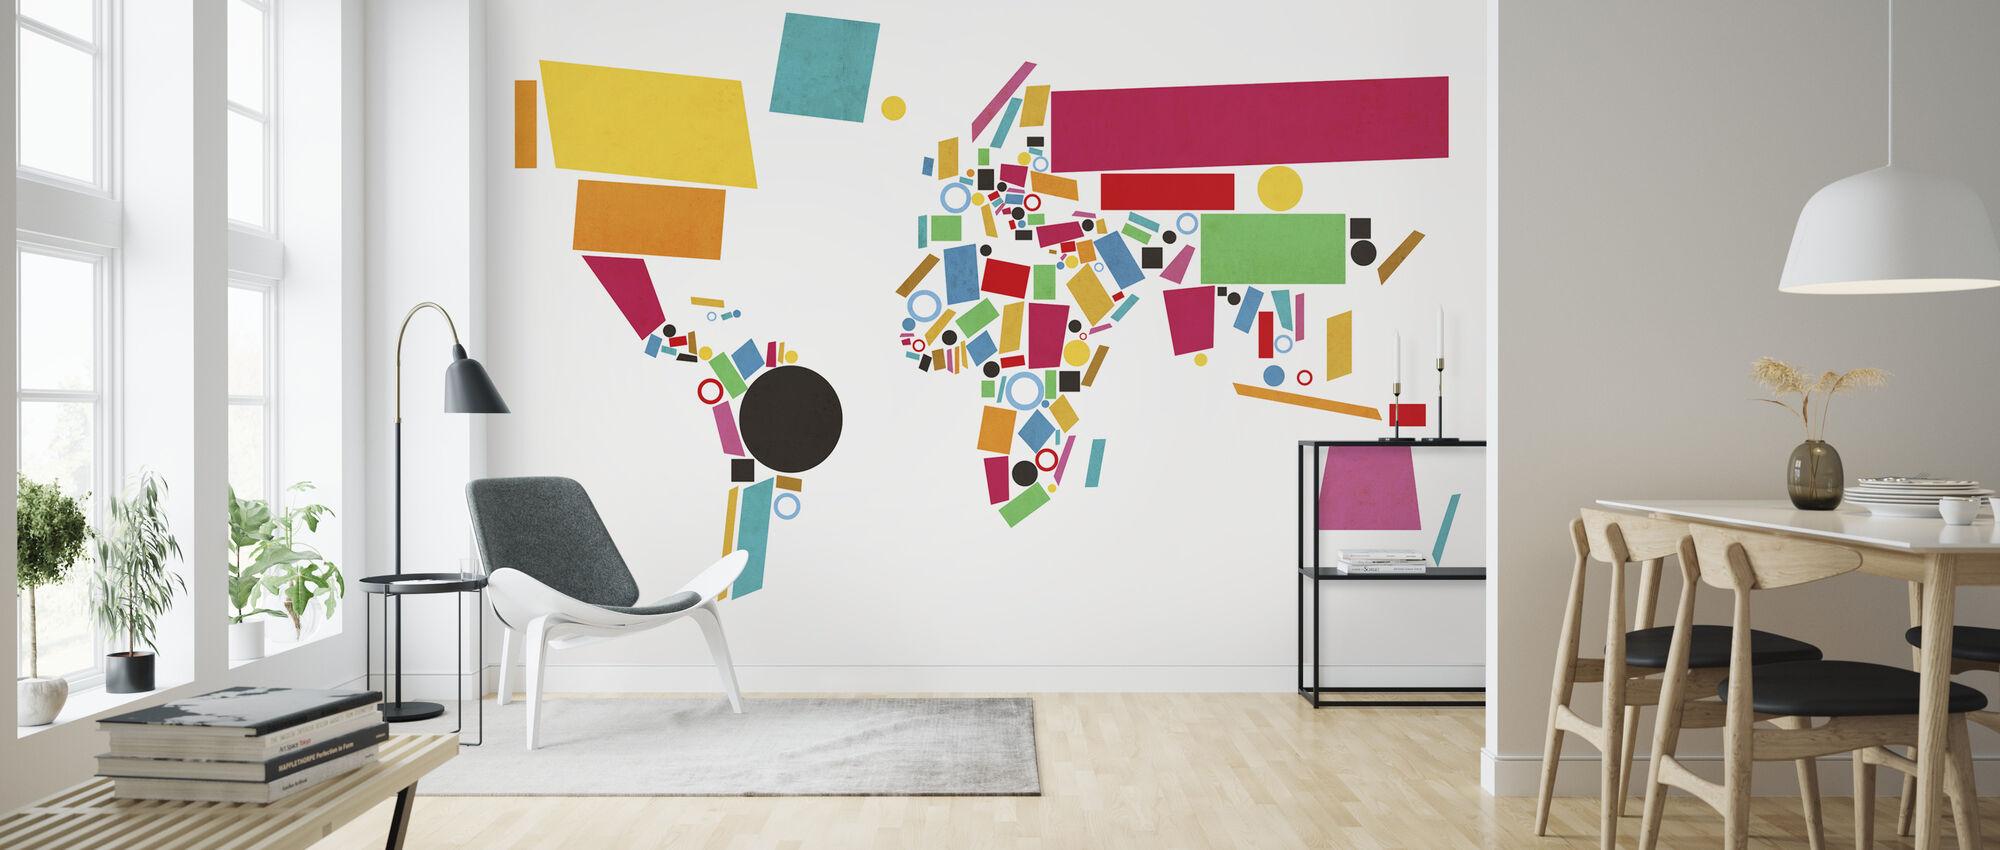 Abstract Wereld Kaart Vierkanten 2 - Behang - Woonkamer